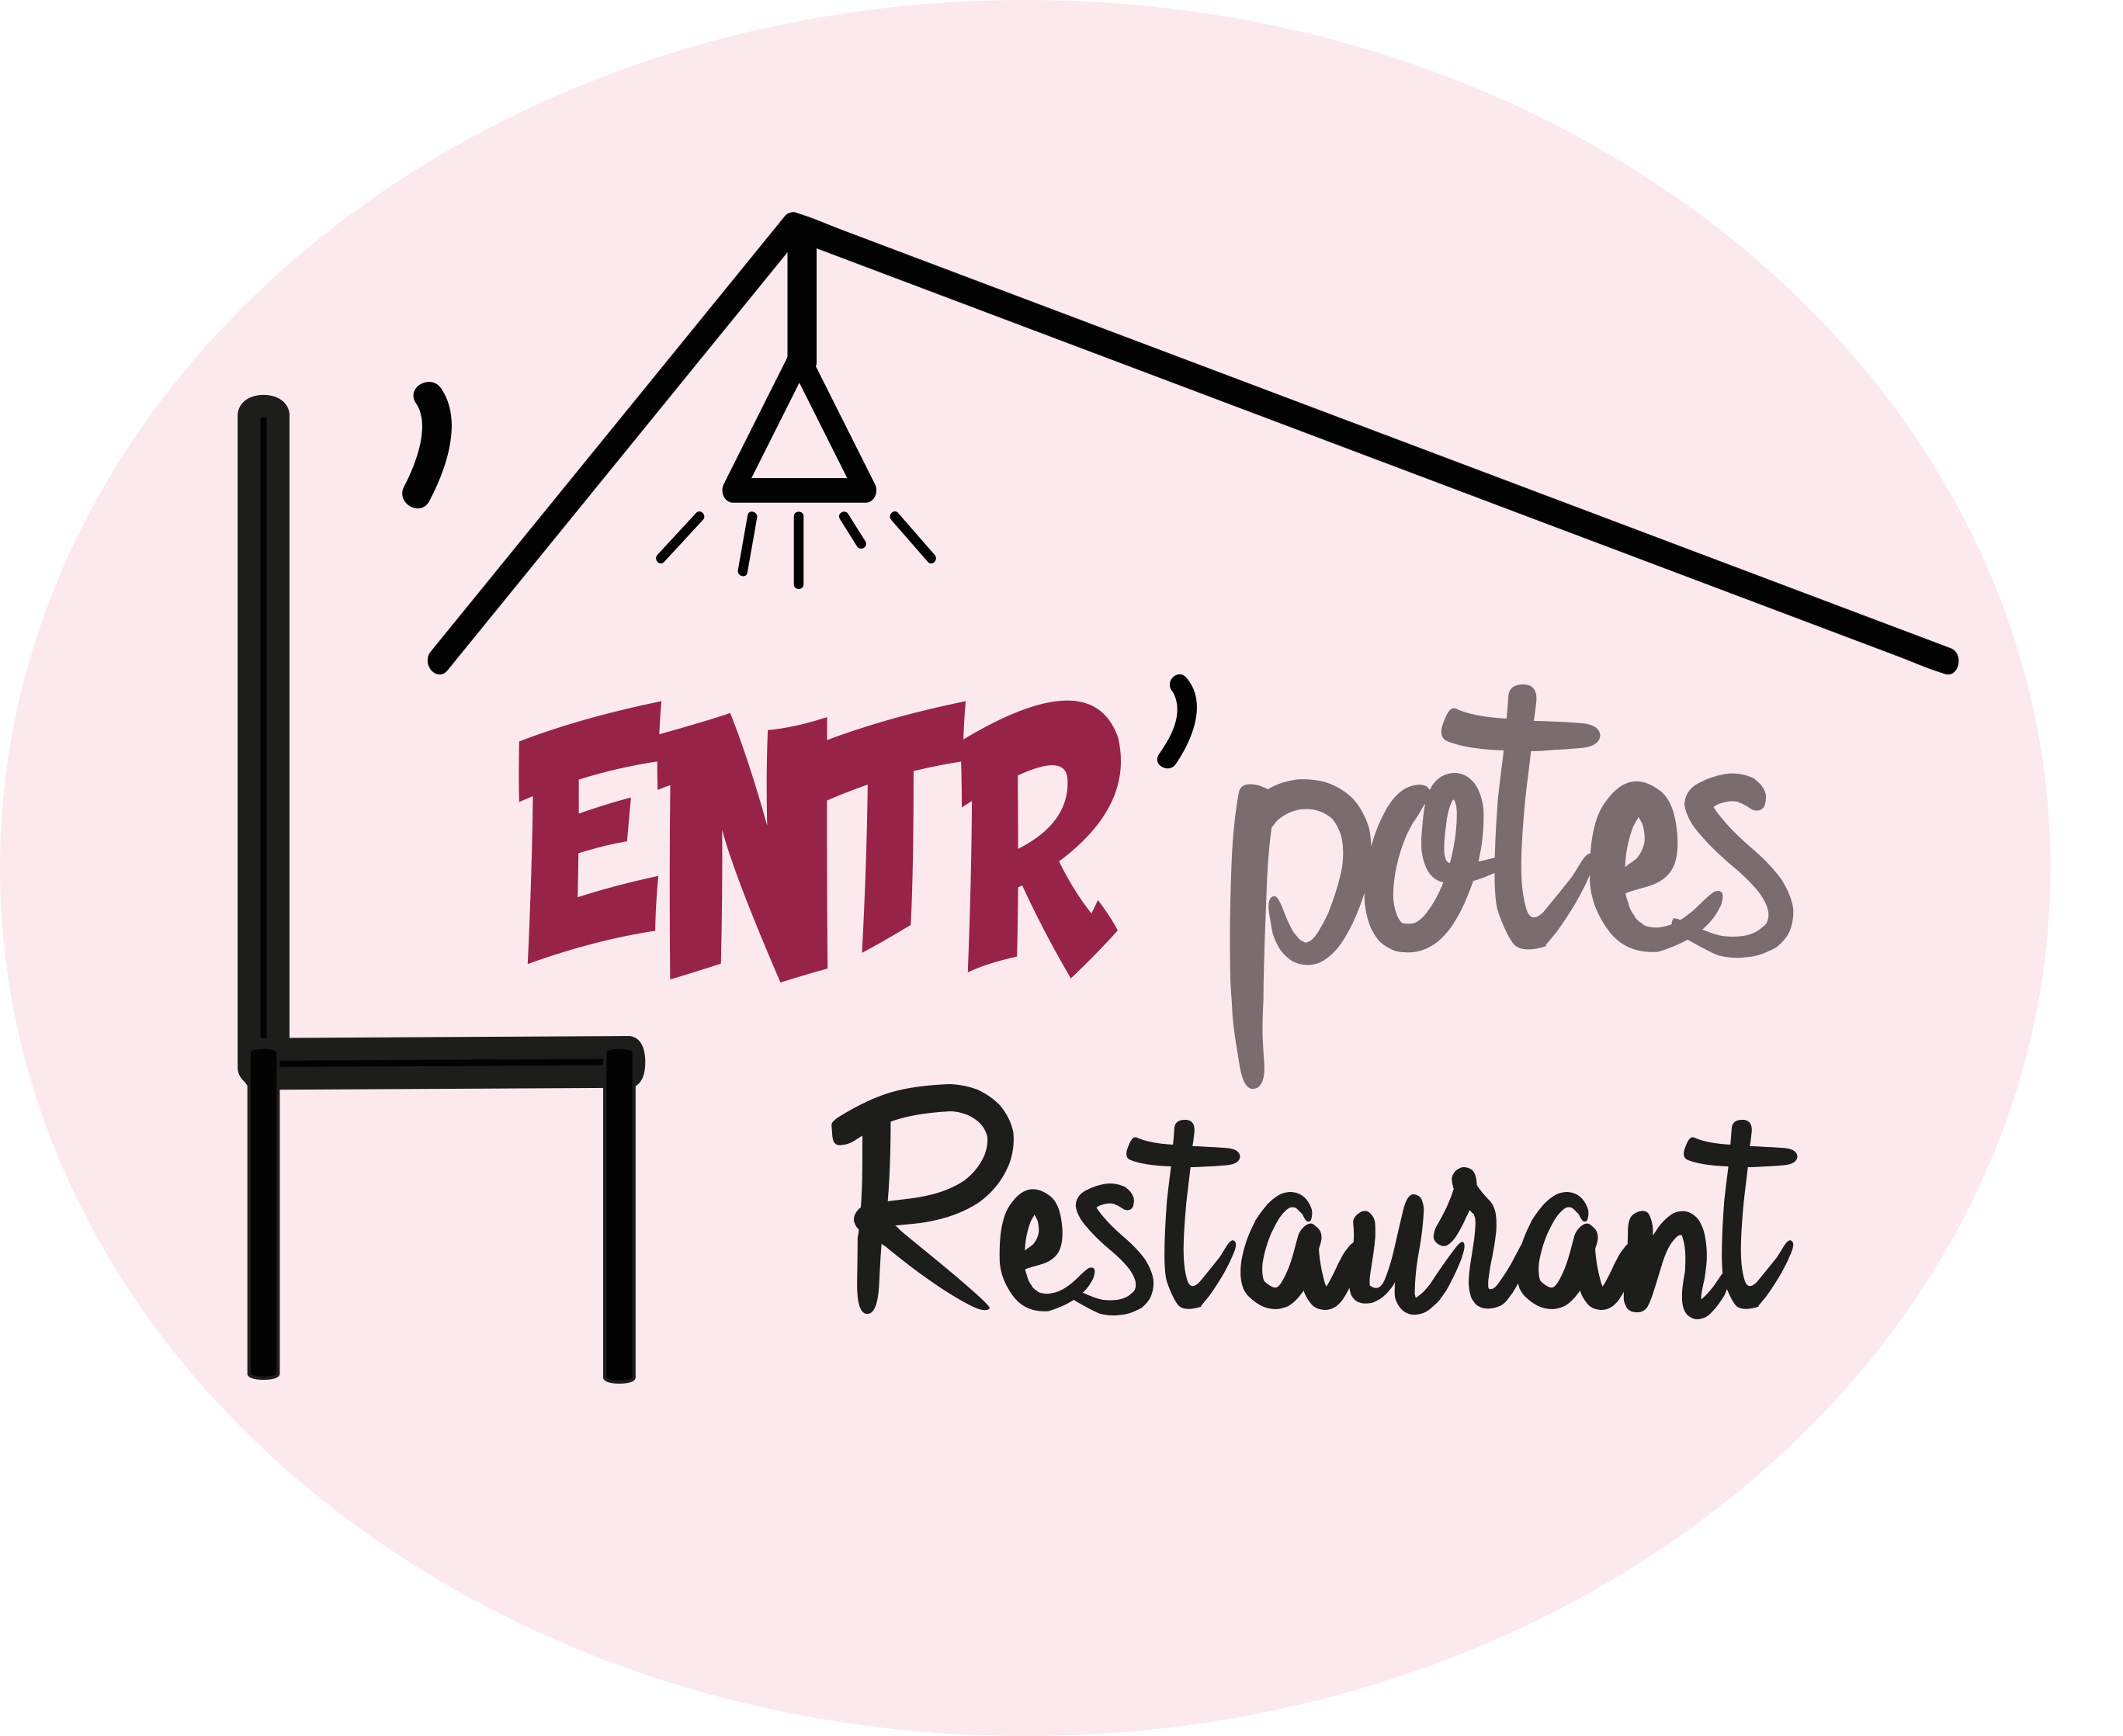 L'ENTR'potes Logo